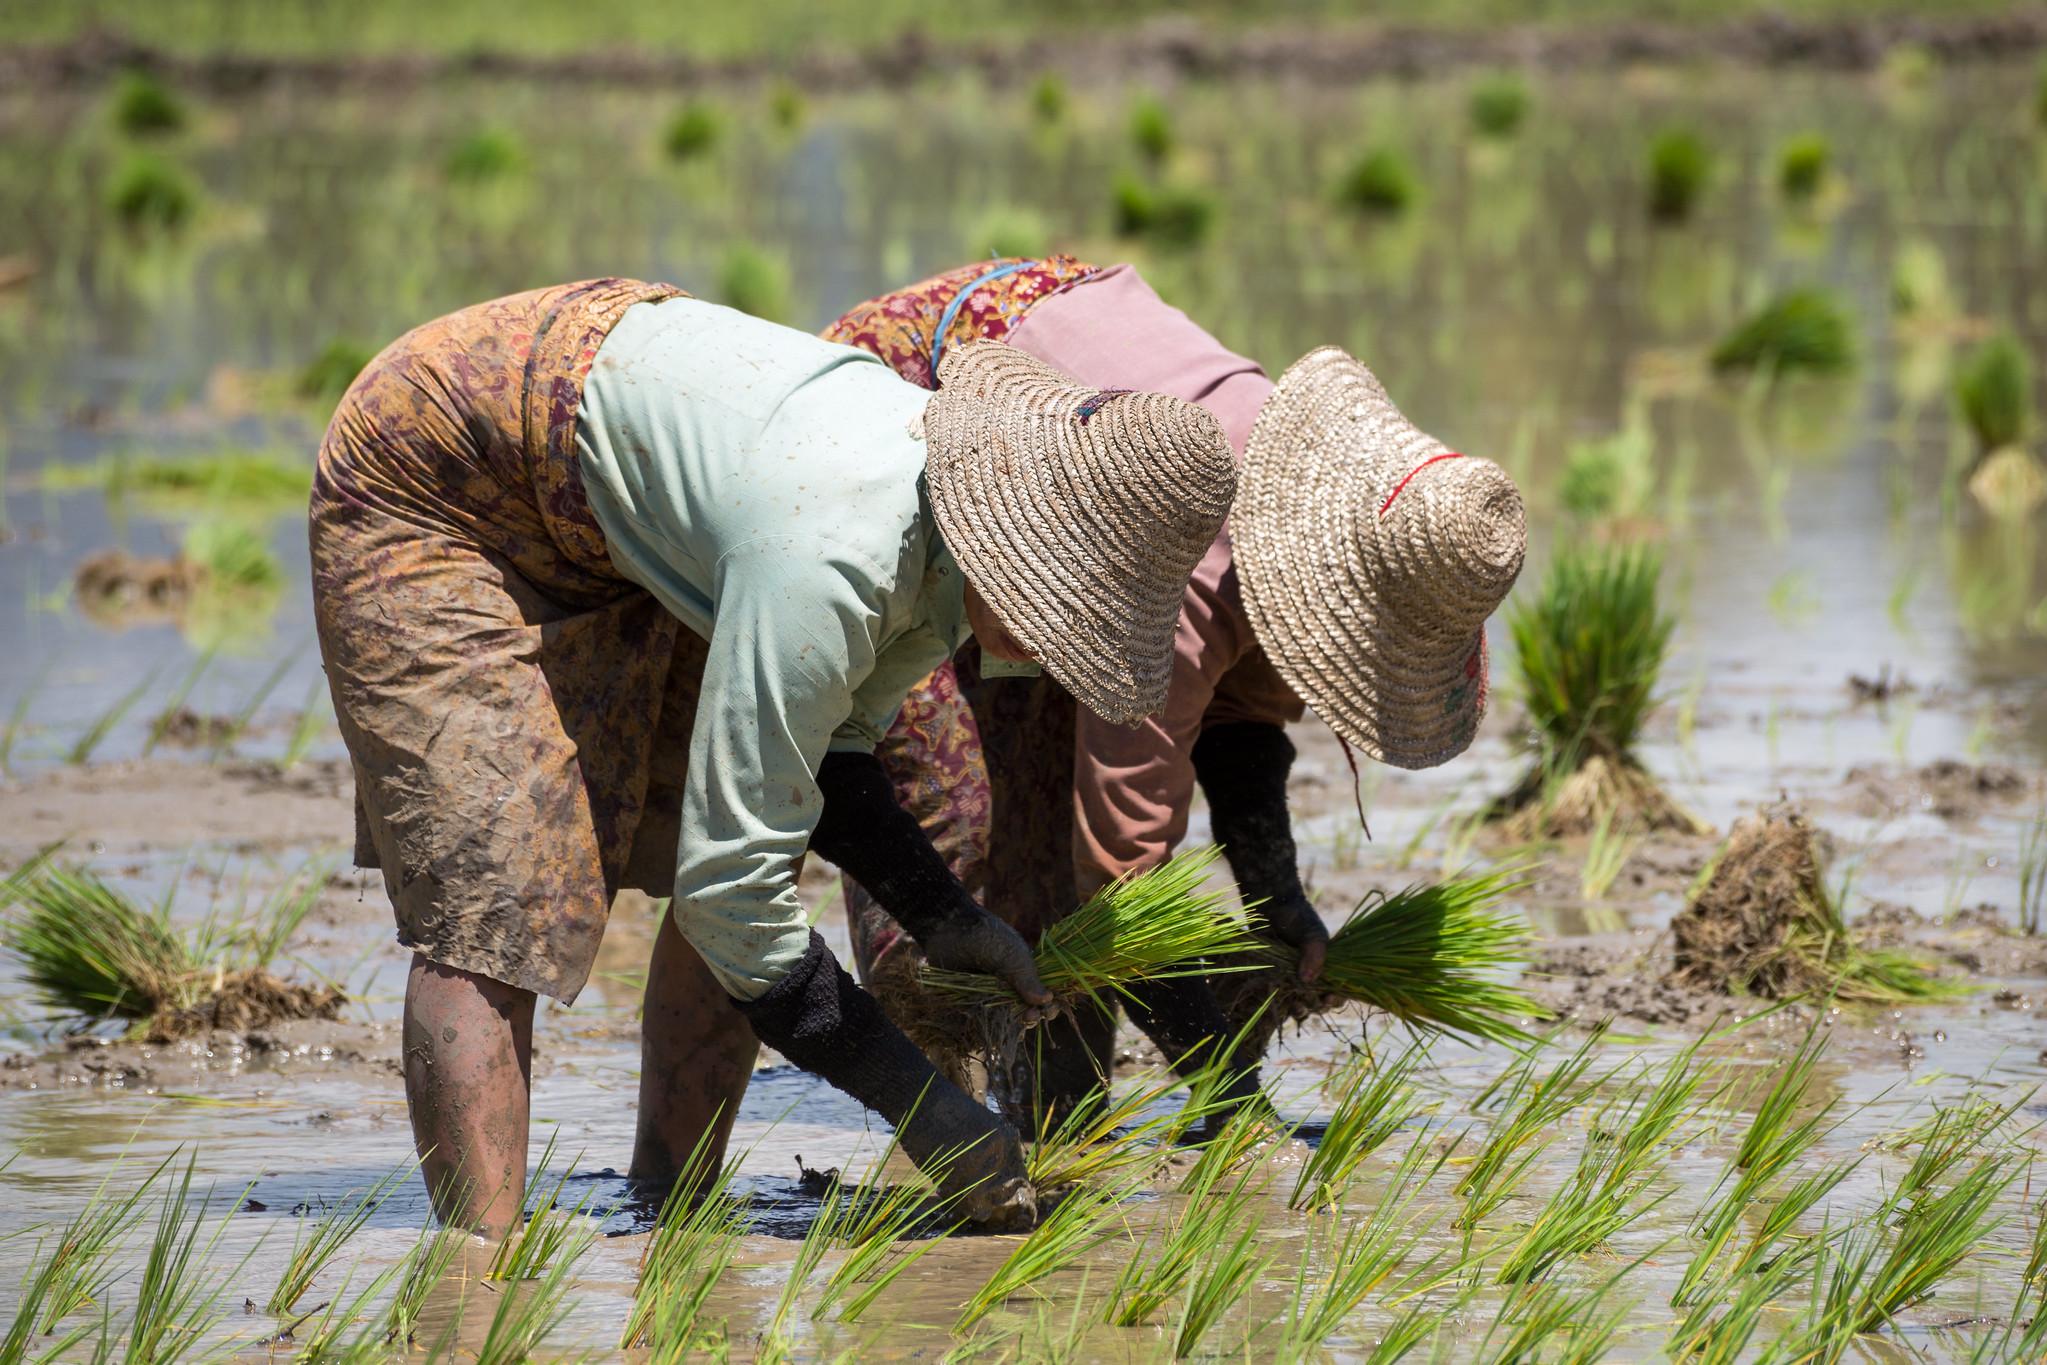 "土地權利不只關乎緬甸的農業生產,也是族群和平的關鍵課題。(攝影:Alex Berger@<a  data-cke-saved-href=""https://www.flickr.com/photos/virtualwayfarer/29799468940/in/photolist-Mph4Vf-LQct7s-Mph5iu-MFer5b-McFe9x-MFetr5-LnvNh7-LnvNGW-MgMhAG-MFewUY-L877xs-MFeuPL-MFevUm-LnvyGG-MRjHZg-MHXEDD-MHXDwZ-LTQCkq-LTSdNa-LTSioc-MFesxb-Mph5Vm-MFewGo-MFexGQ-MFexnS-LTQE2S-LQcsyo-LXhi6a-KW7oe2-Lrzgx5-LrzdDE-KW7oQ2-LHufgy-KVUm3d-LT51zX-KVUHSf-MbzvNb-M2nwjW-KW7evR-KW7d1M-LHtZTL-L86Z8C-LrzFBN-LCK5wS-LCK43E-LUEJVb-MCwsZF-MCwsmM-LXhfAR-LCK7NA"" href=""https://www.flickr.com/photos/virtualwayfarer/29799468940/in/photolist-Mph4Vf-LQct7s-Mph5iu-MFer5b-McFe9x-MFetr5-LnvNh7-LnvNGW-MgMhAG-MFewUY-L877xs-MFeuPL-MFevUm-LnvyGG-MRjHZg-MHXEDD-MHXDwZ-LTQCkq-LTSdNa-LTSioc-MFesxb-Mph5Vm-MFewGo-MFexGQ-MFexnS-LTQE2S-LQcsyo-LXhi6a-KW7oe2-Lrzgx5-LrzdDE-KW7oQ2-LHufgy-KVUm3d-LT51zX-KVUHSf-MbzvNb-M2nwjW-KW7evR-KW7d1M-LHtZTL-L86Z8C-LrzFBN-LCK5wS-LCK43E-LUEJVb-MCwsZF-MCwsmM-LXhfAR-LCK7NA"">Flickr</a>)"